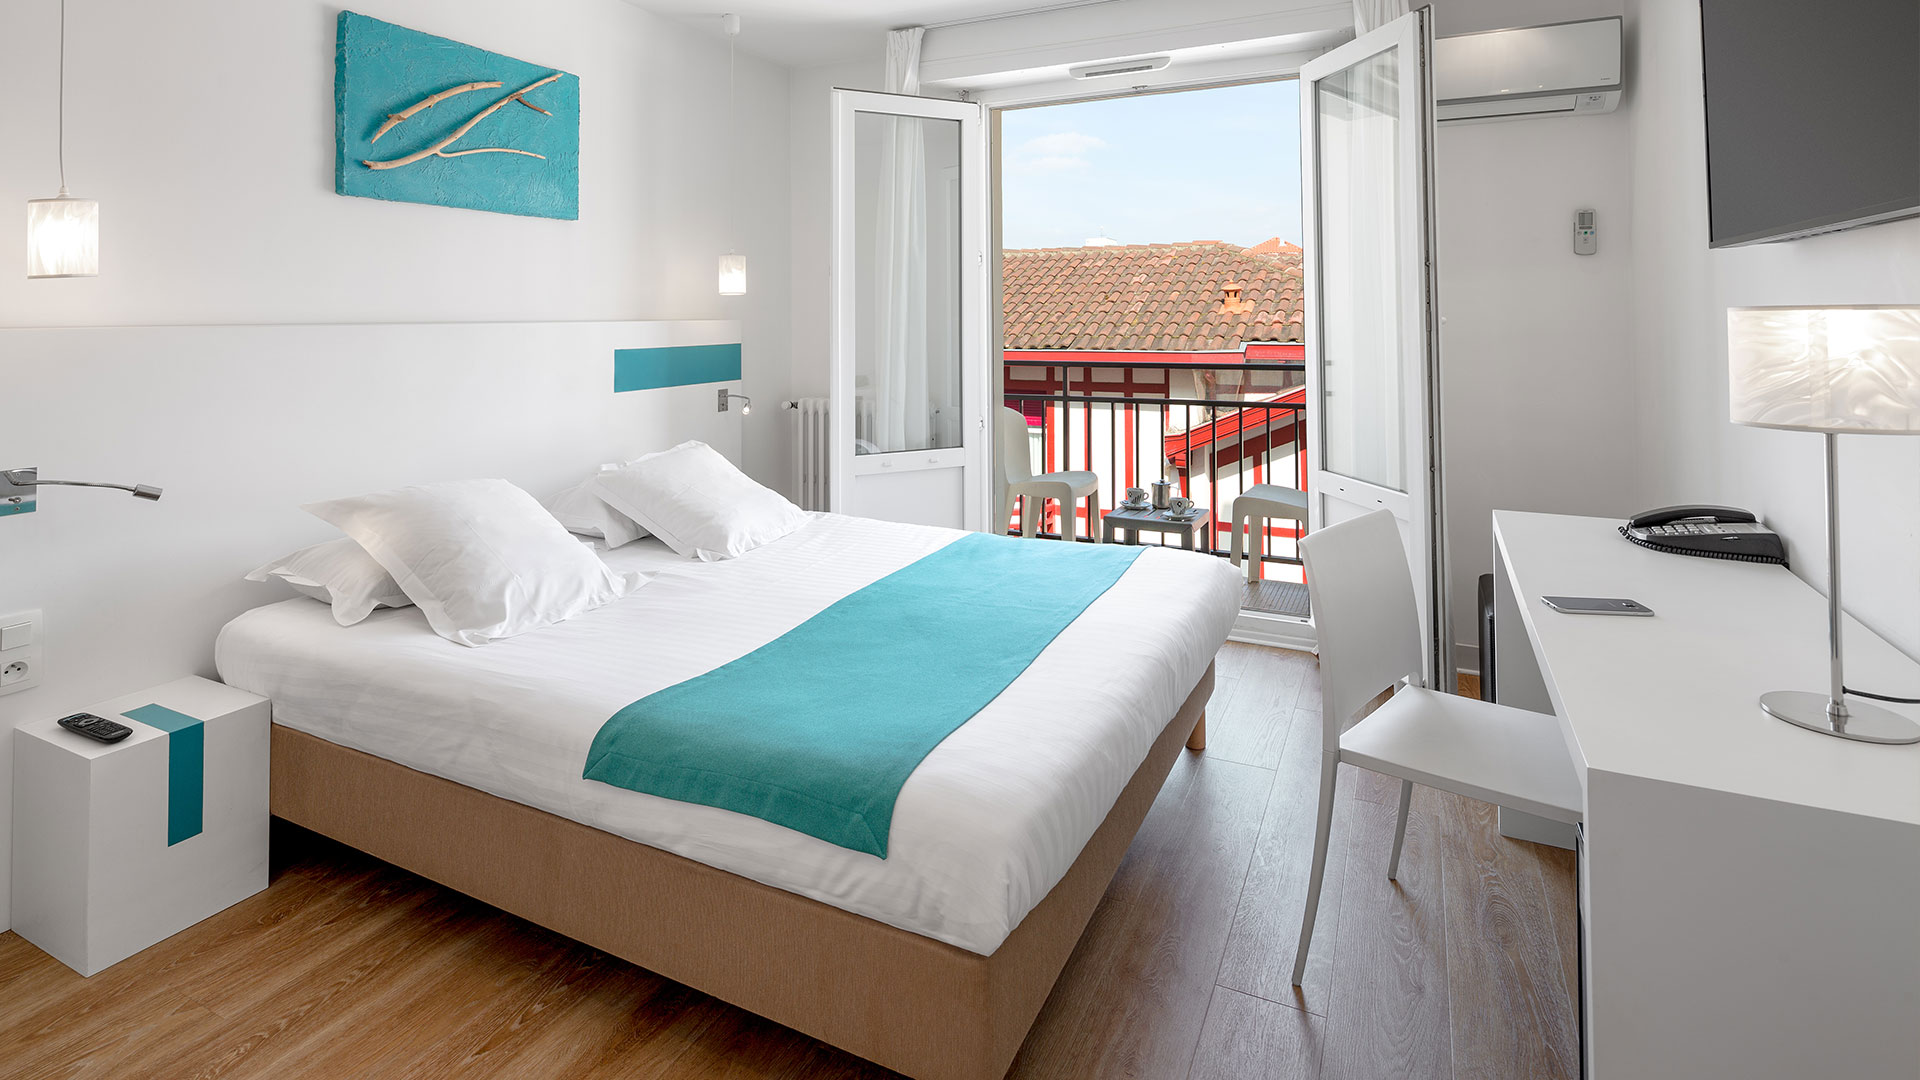 Chambre avec balcon à Biarritz